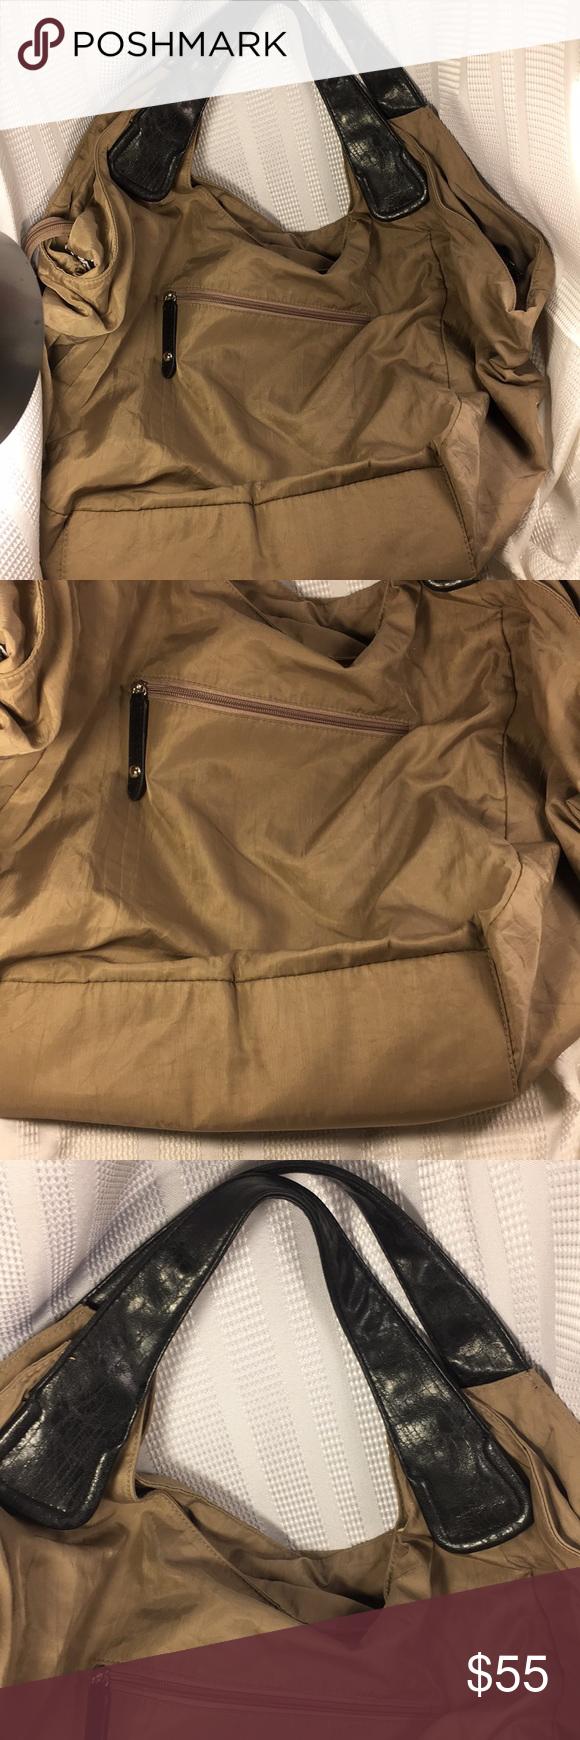 How To Repair Leather Handbags Lovetoknow